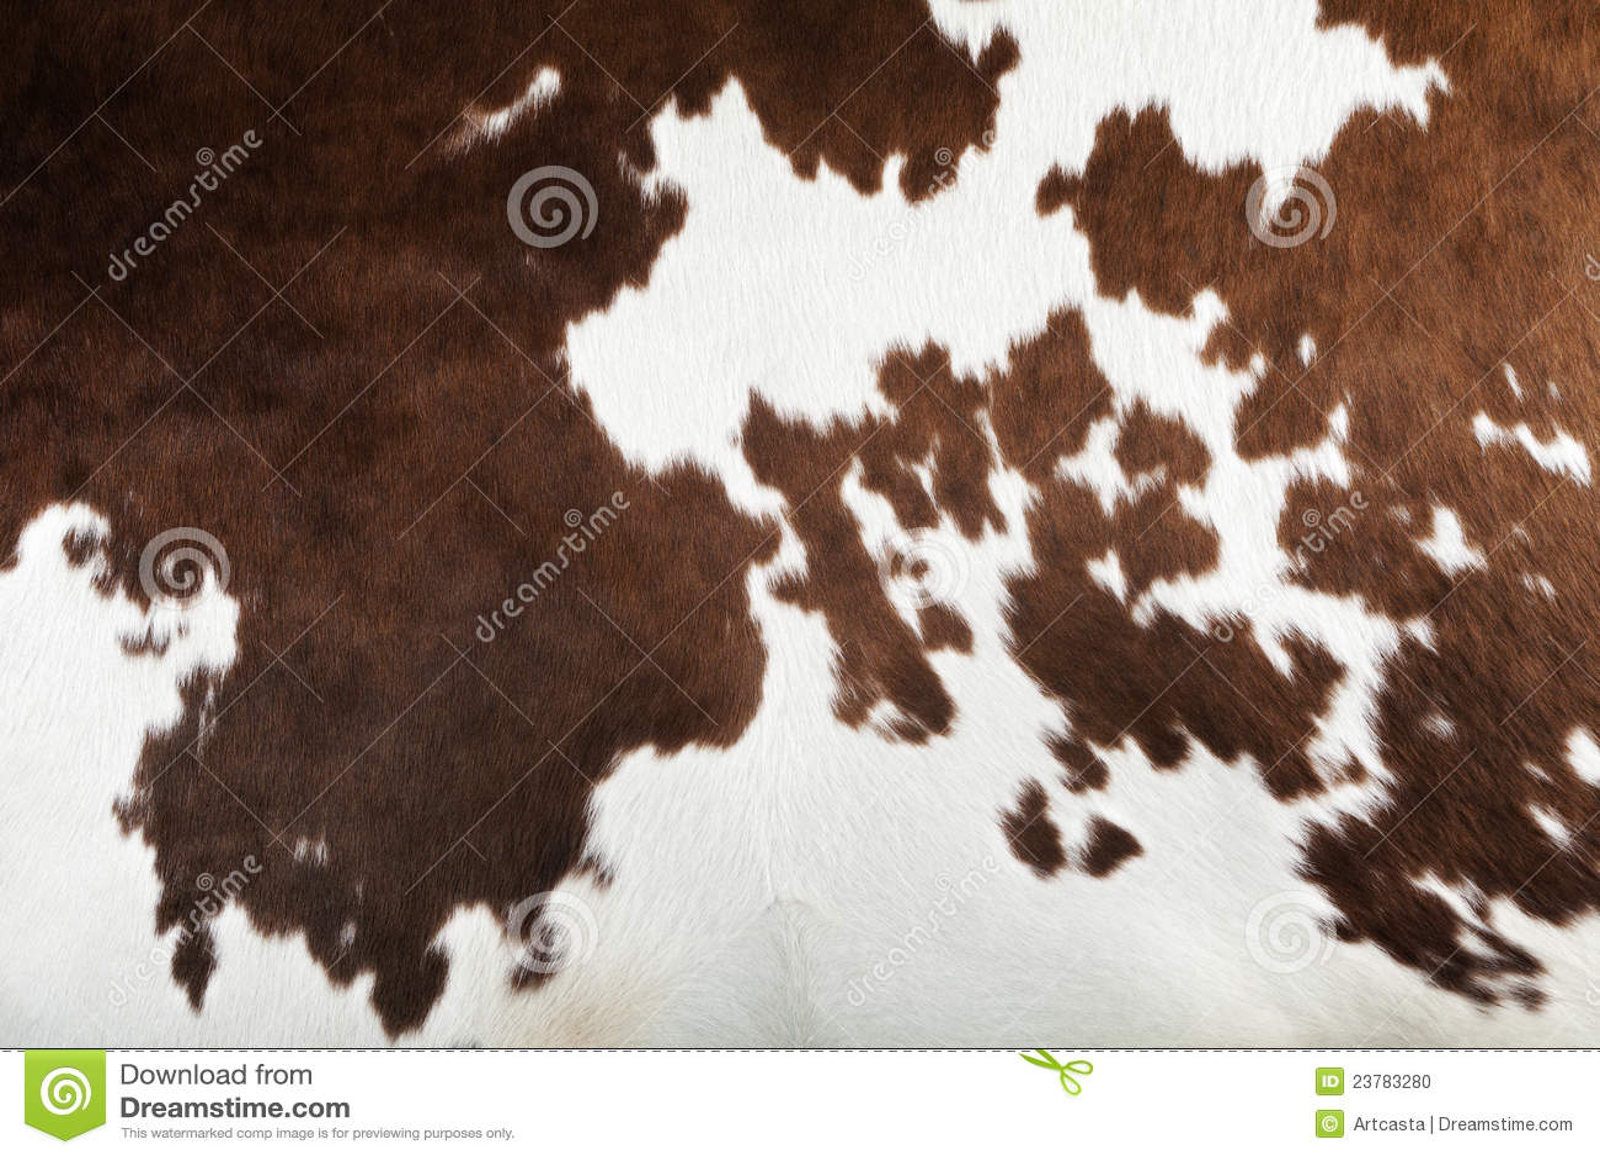 longhorn wallpaper border